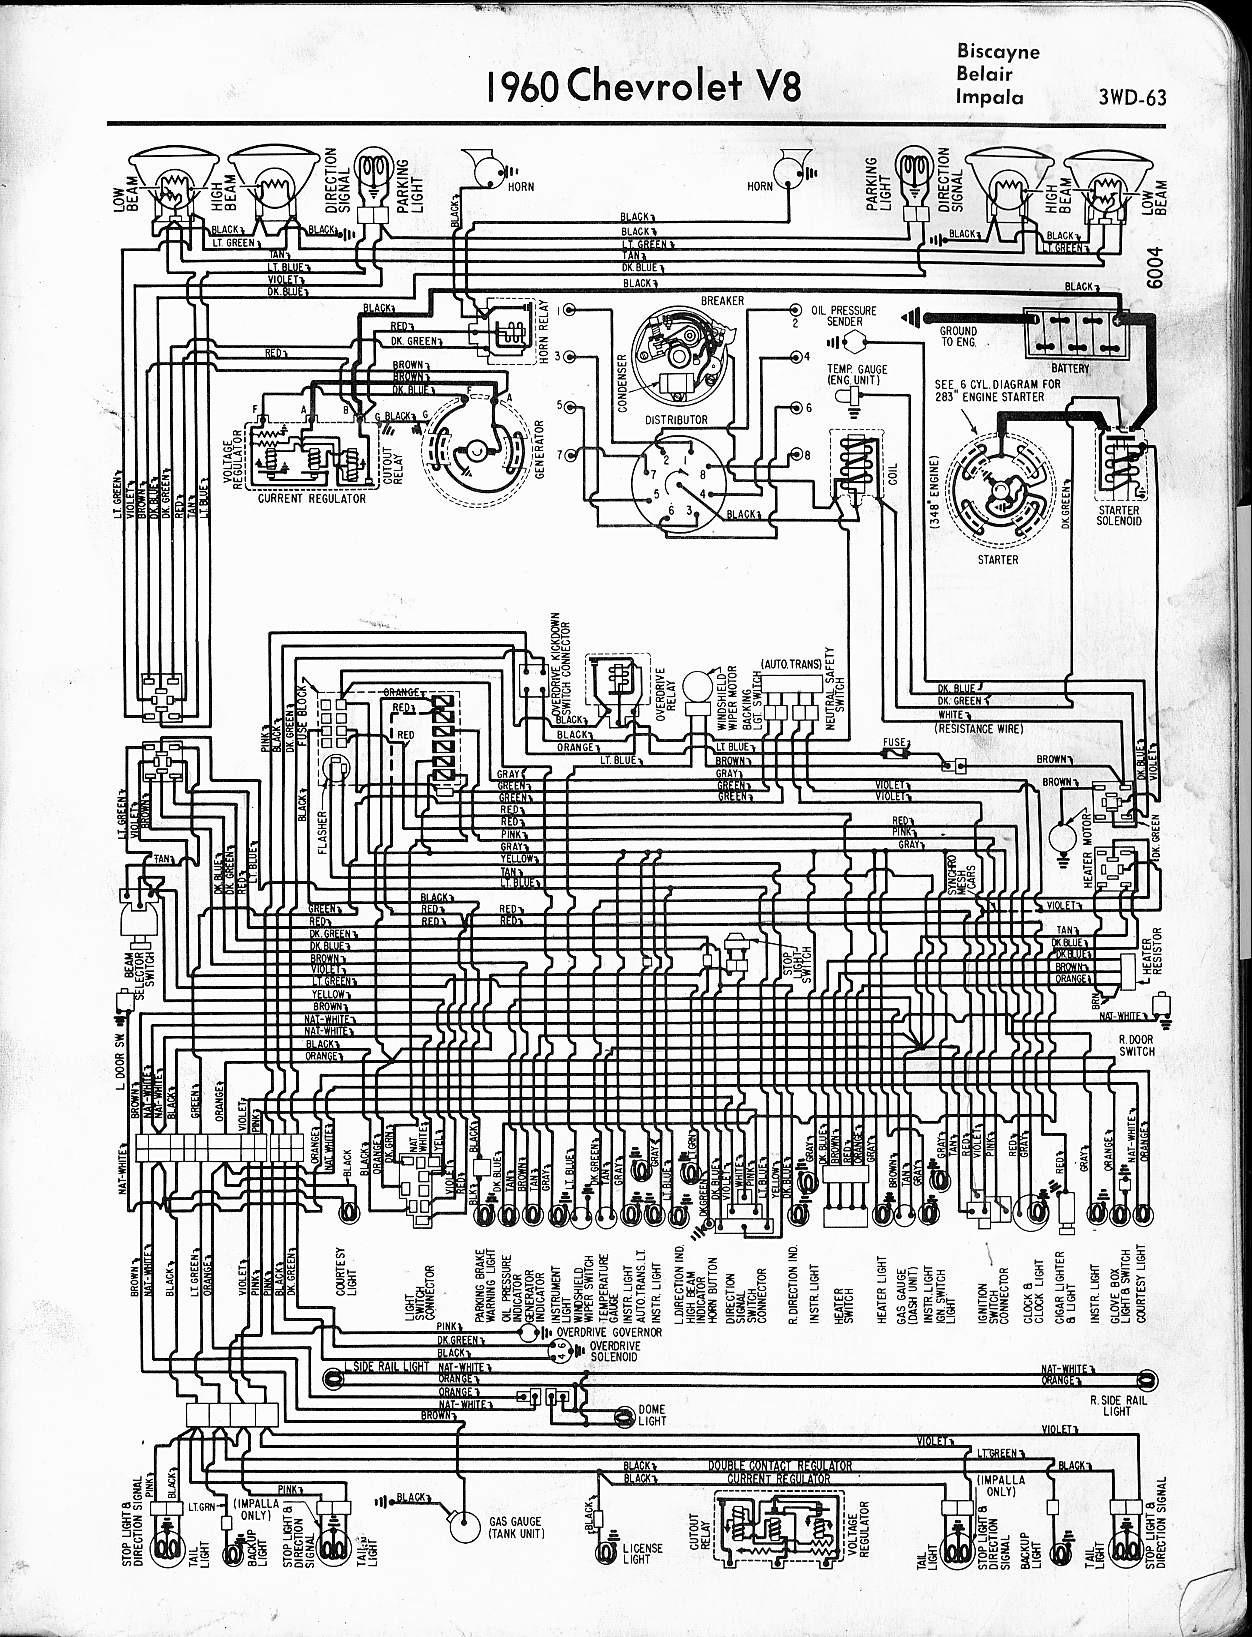 1965 chevy impala wiring diagram 57 65 chevy wiring diagrams wire rh flrishfarm co 1965 Chevy Impala SS Specifications 1965 Impala Custom